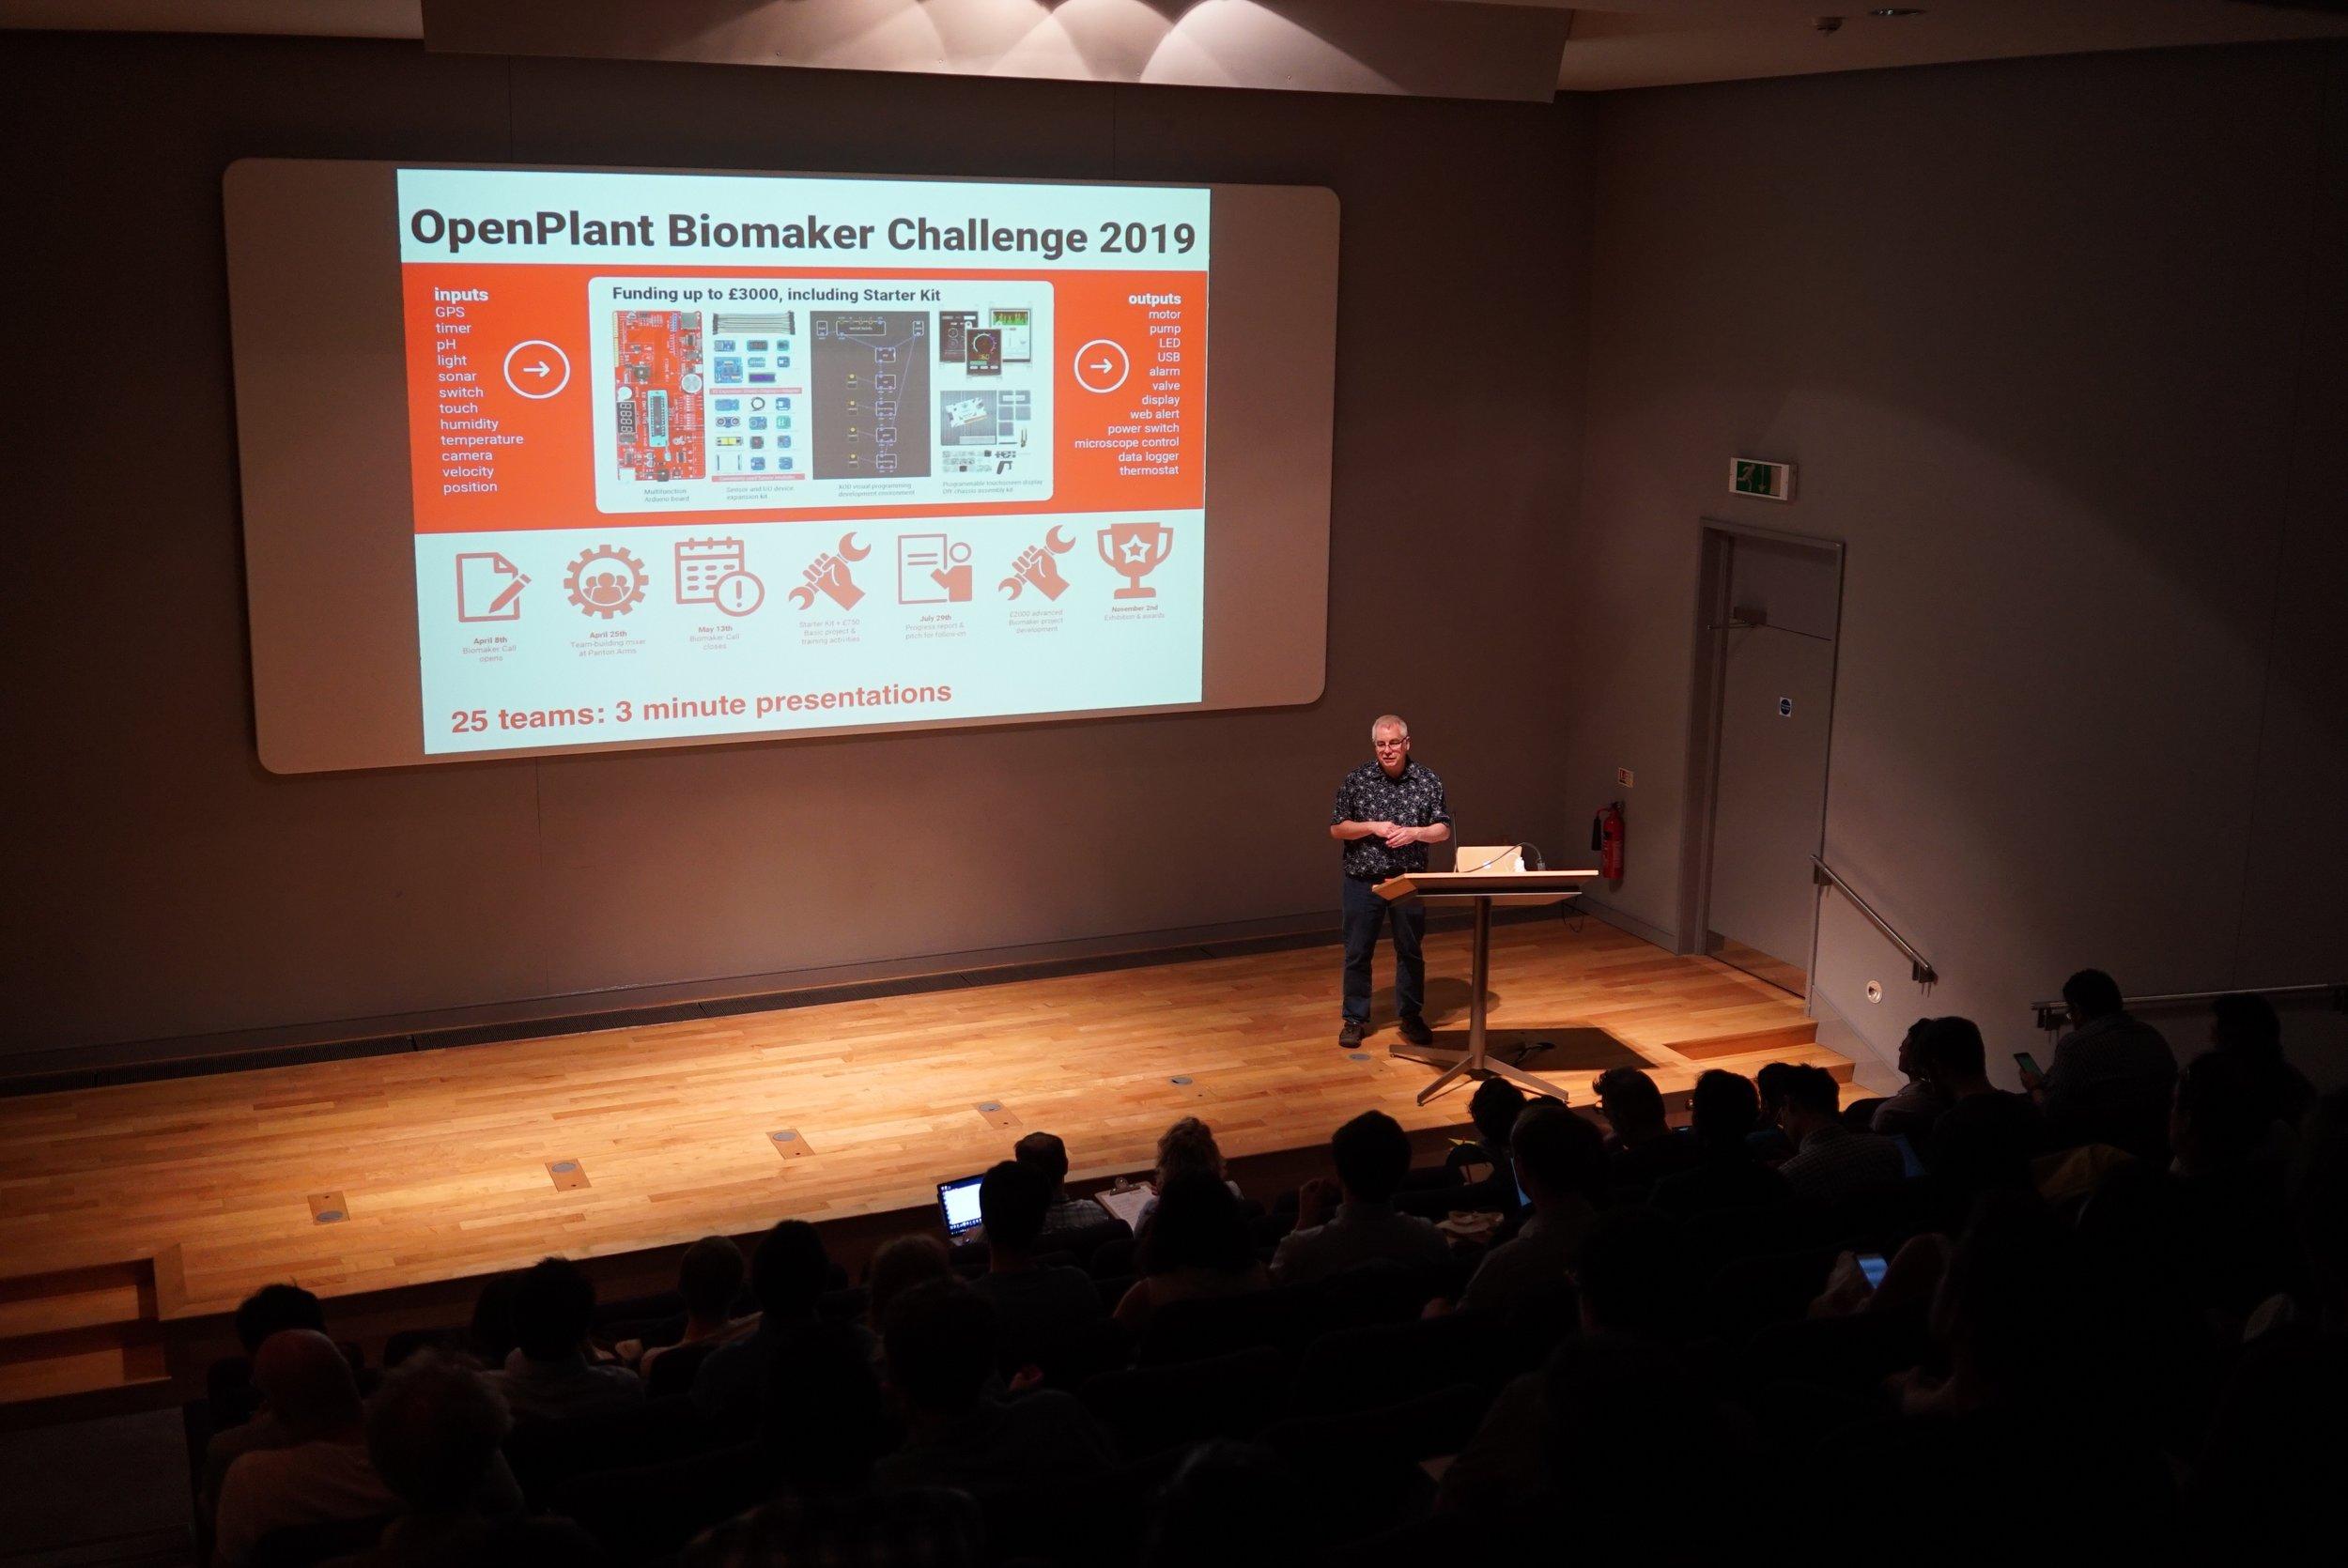 Professor Jim Haselhoff (University of Cambridge) introducing the Biomaker challenge at the 2019 OpenPlant Forum.